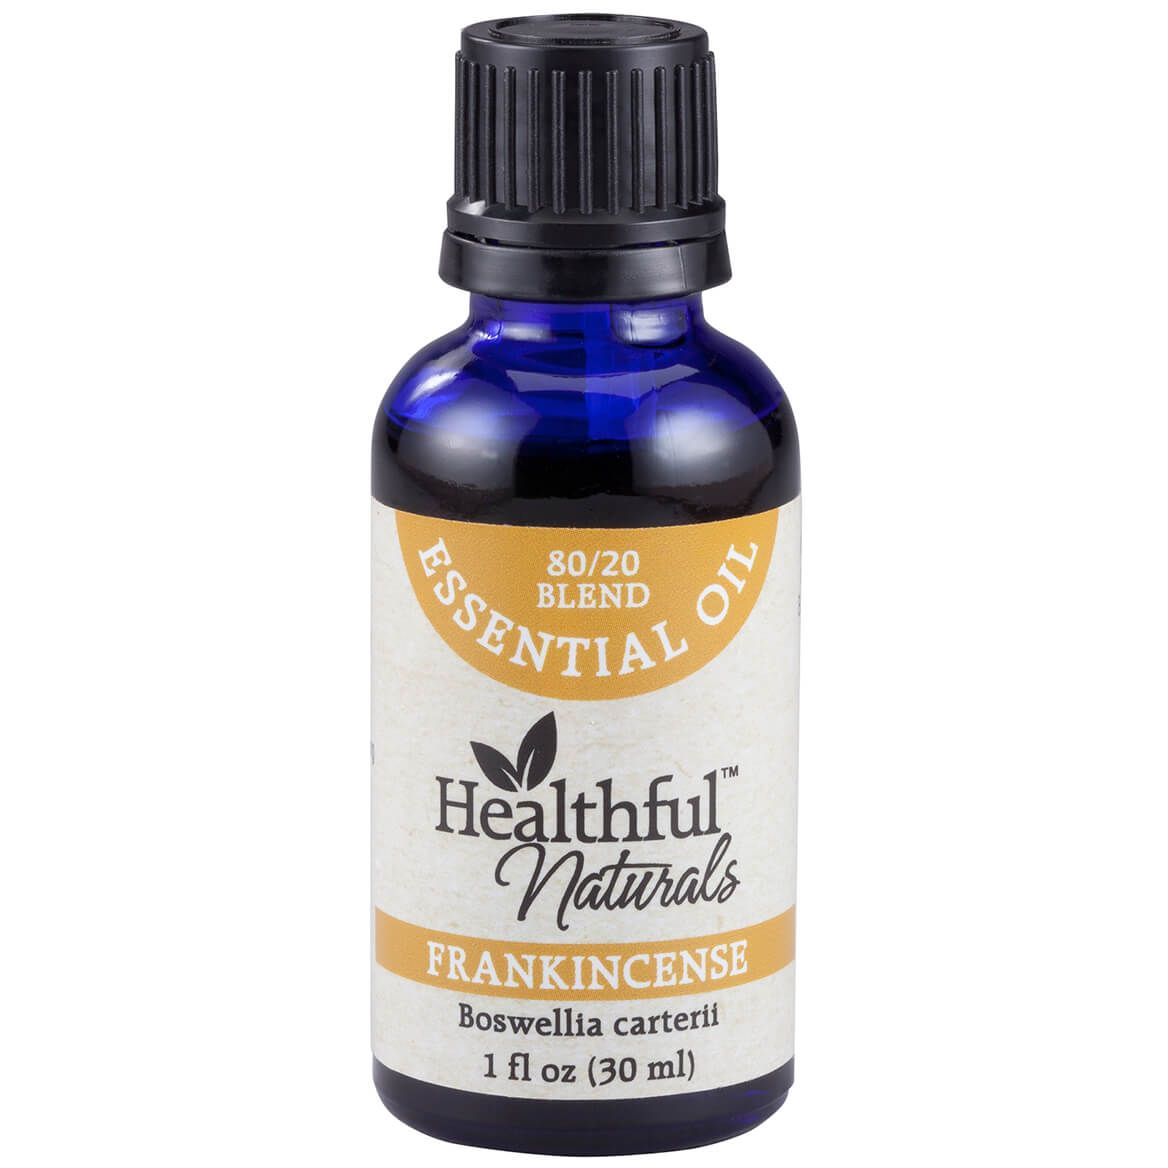 Healthful™ Naturals Frankincense Essential Oil, 30 ml-356513